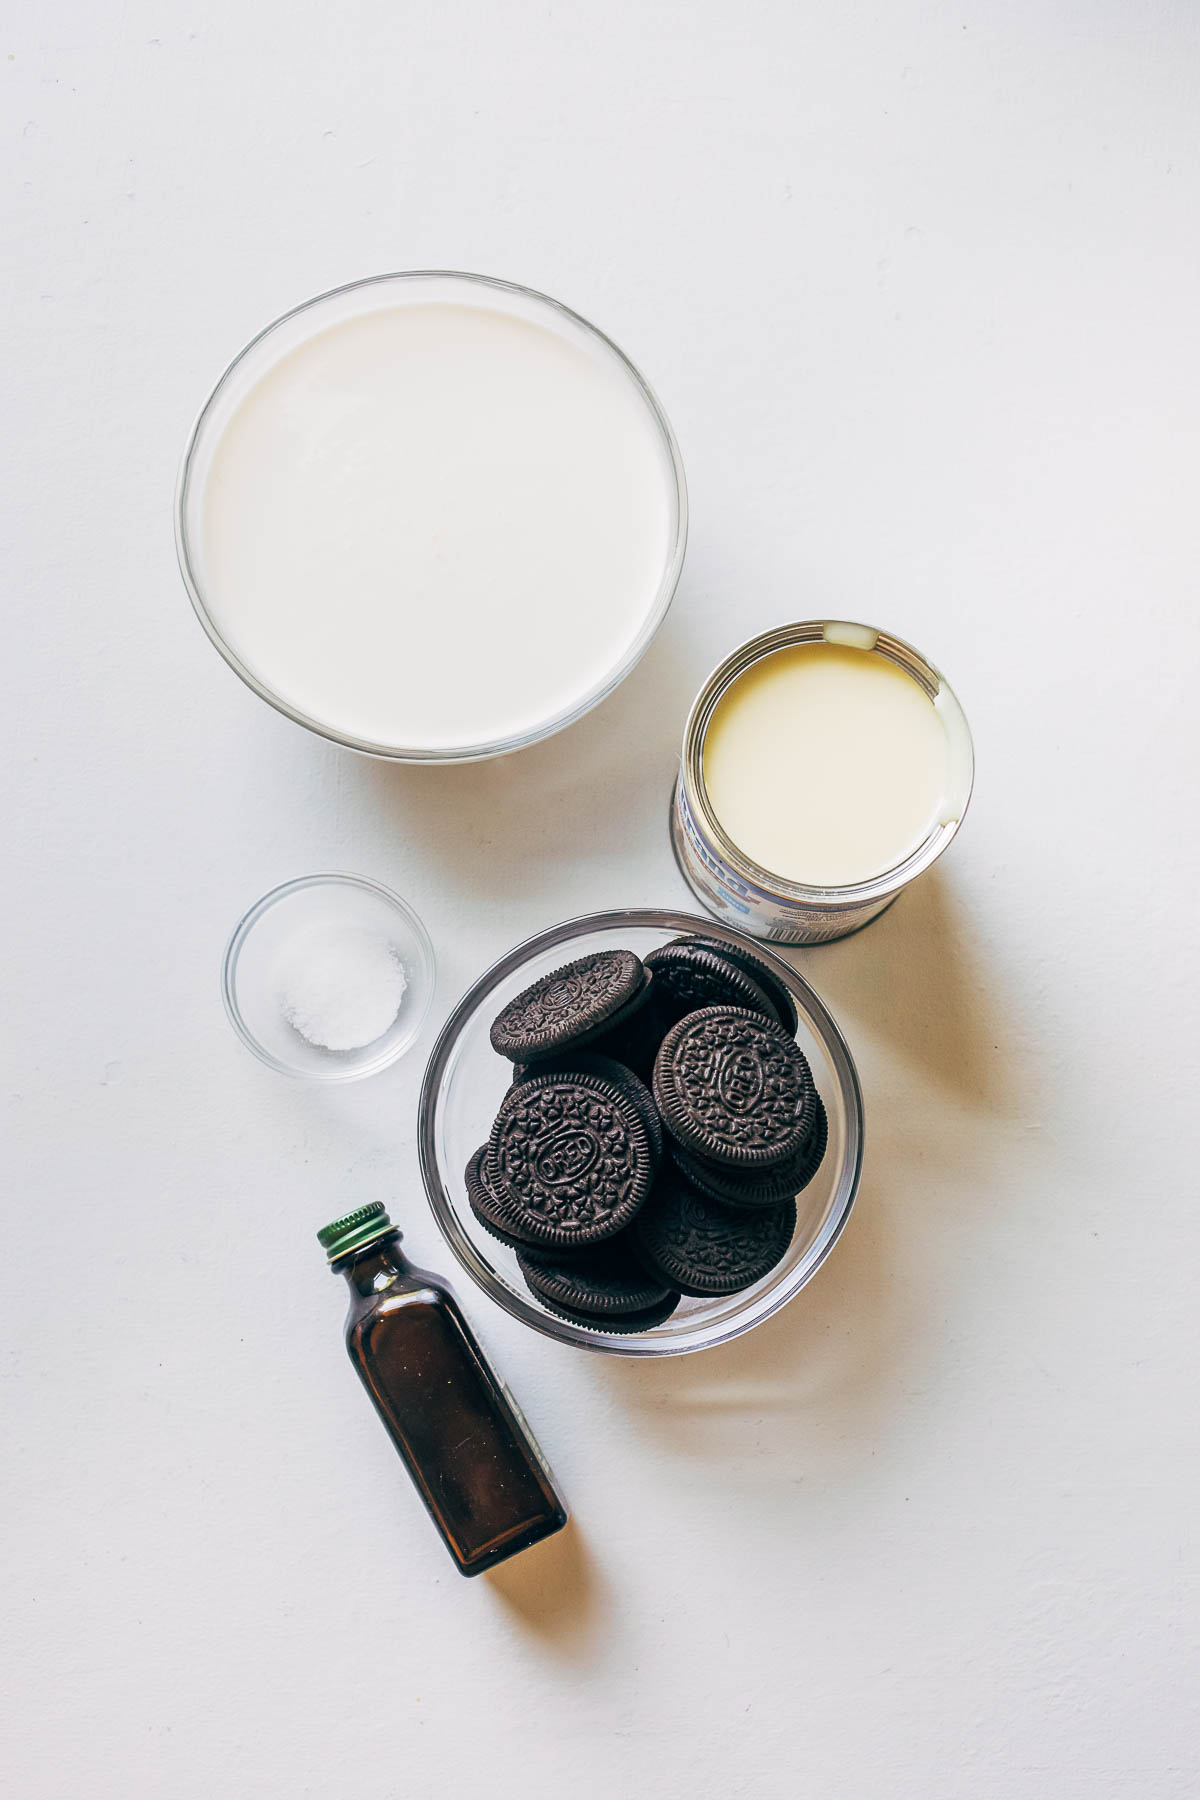 Ingredients to make mint Oreo ice cream.